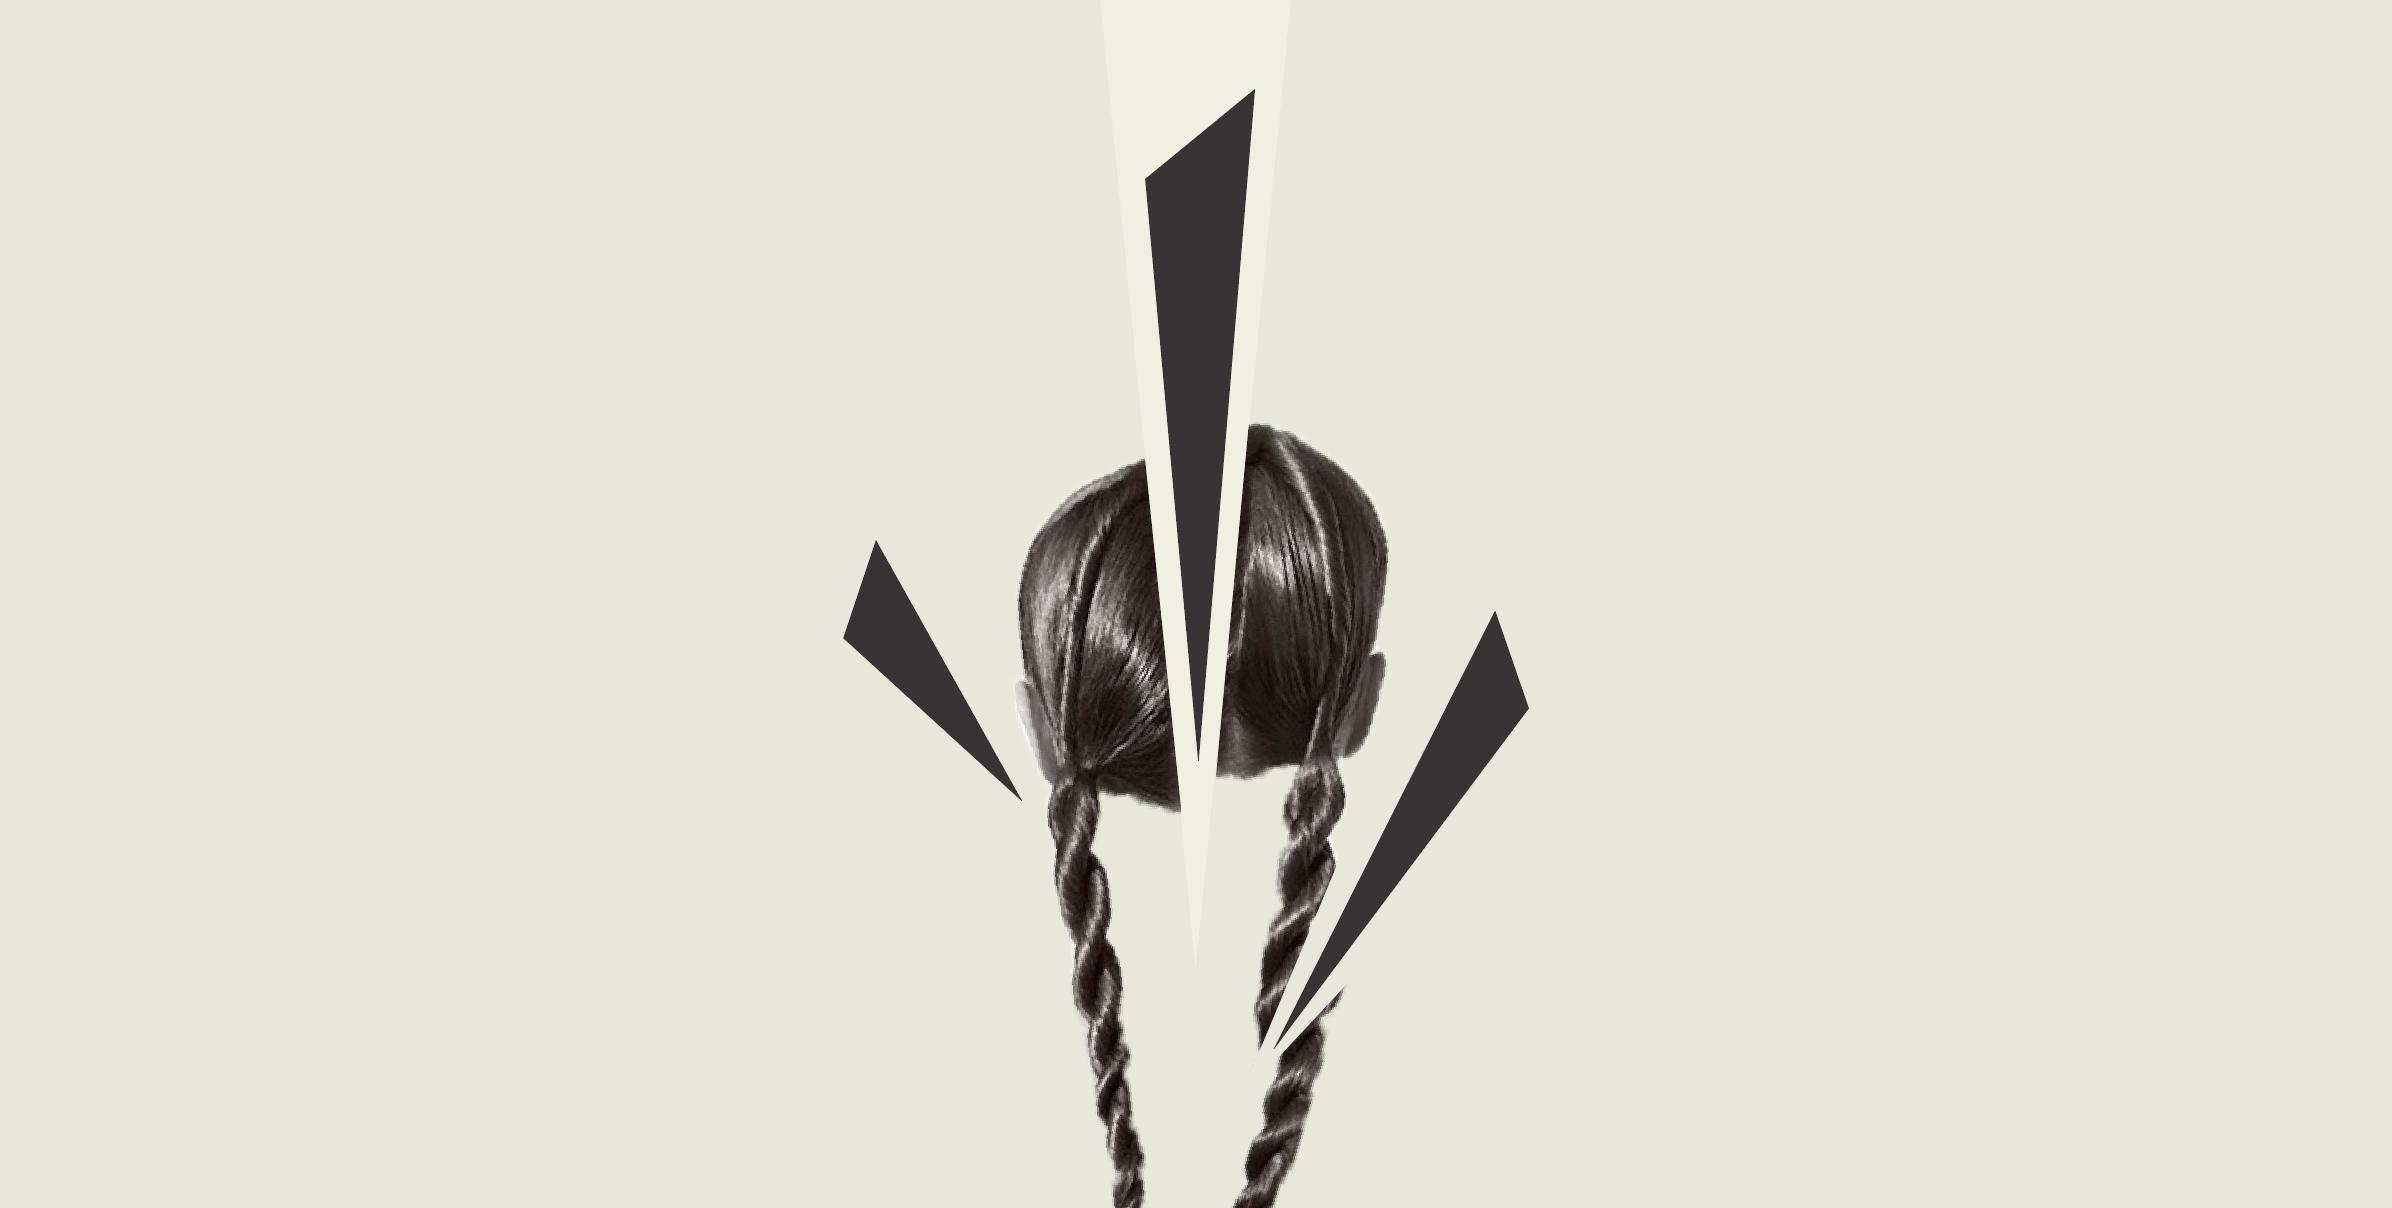 Blog artwork by Mark Malek